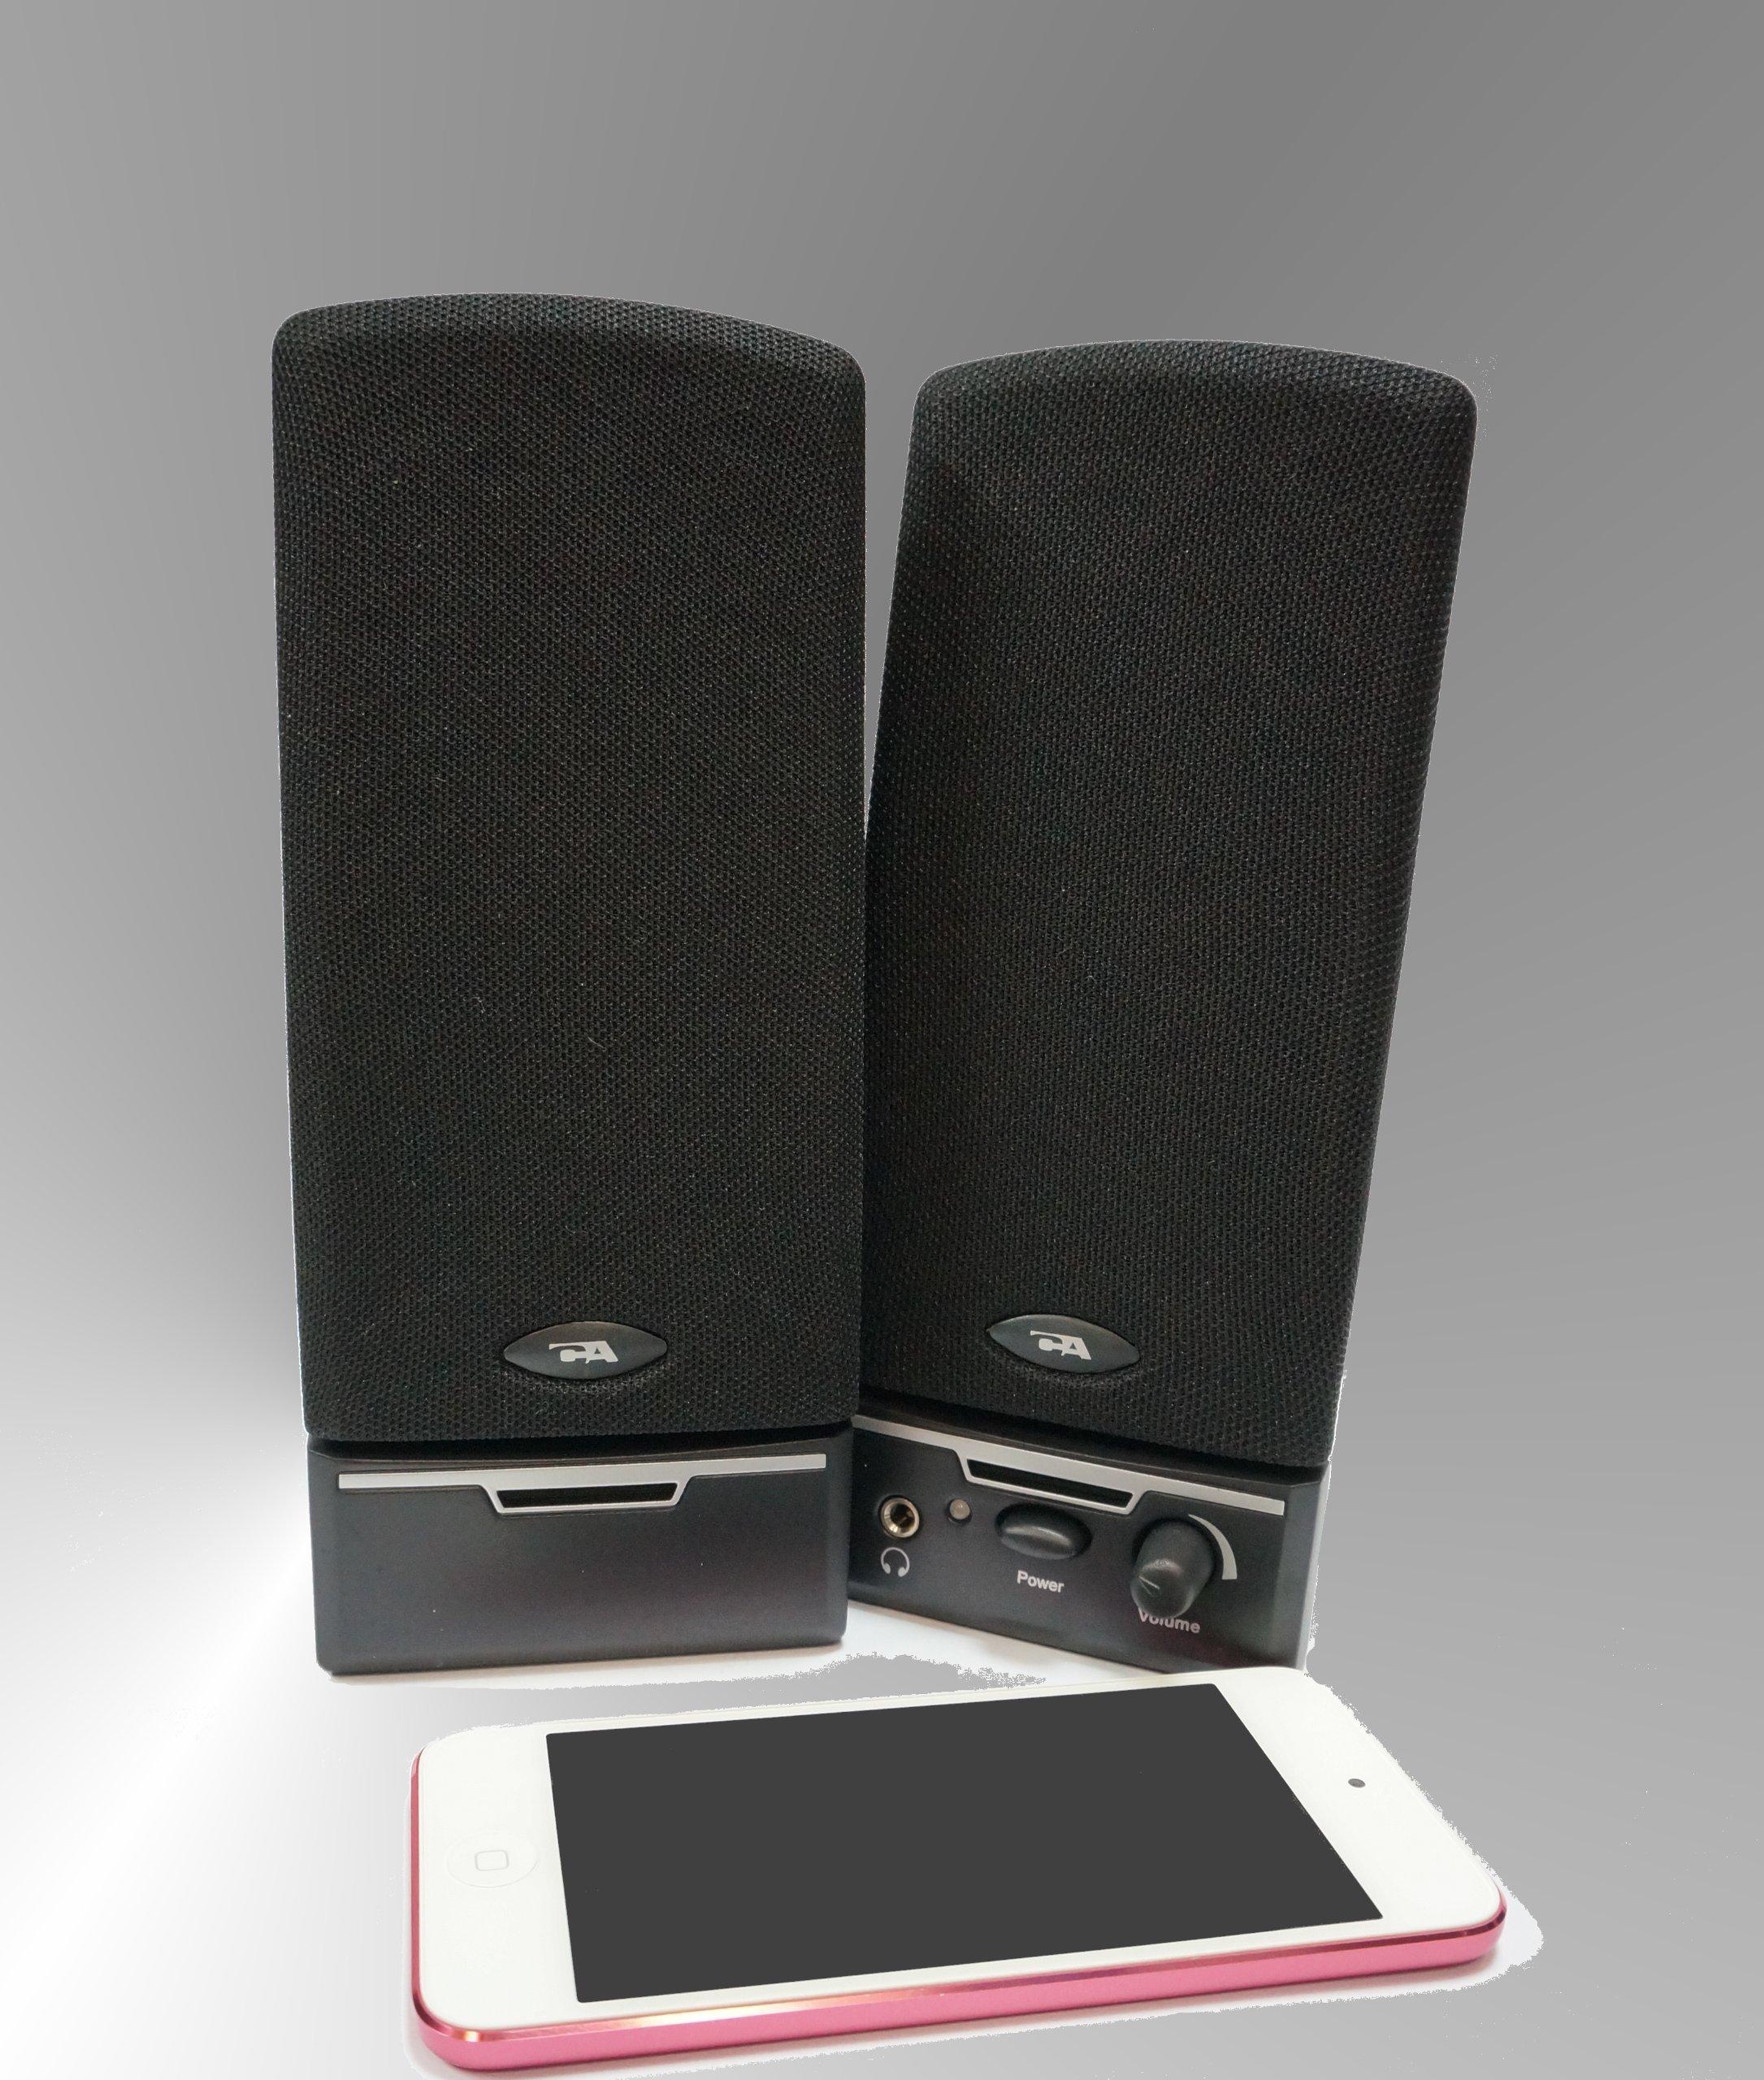 Cyber Acoustics CA-2014 multimedia desktop computer speakers by Cyber Acoustics (Image #8)